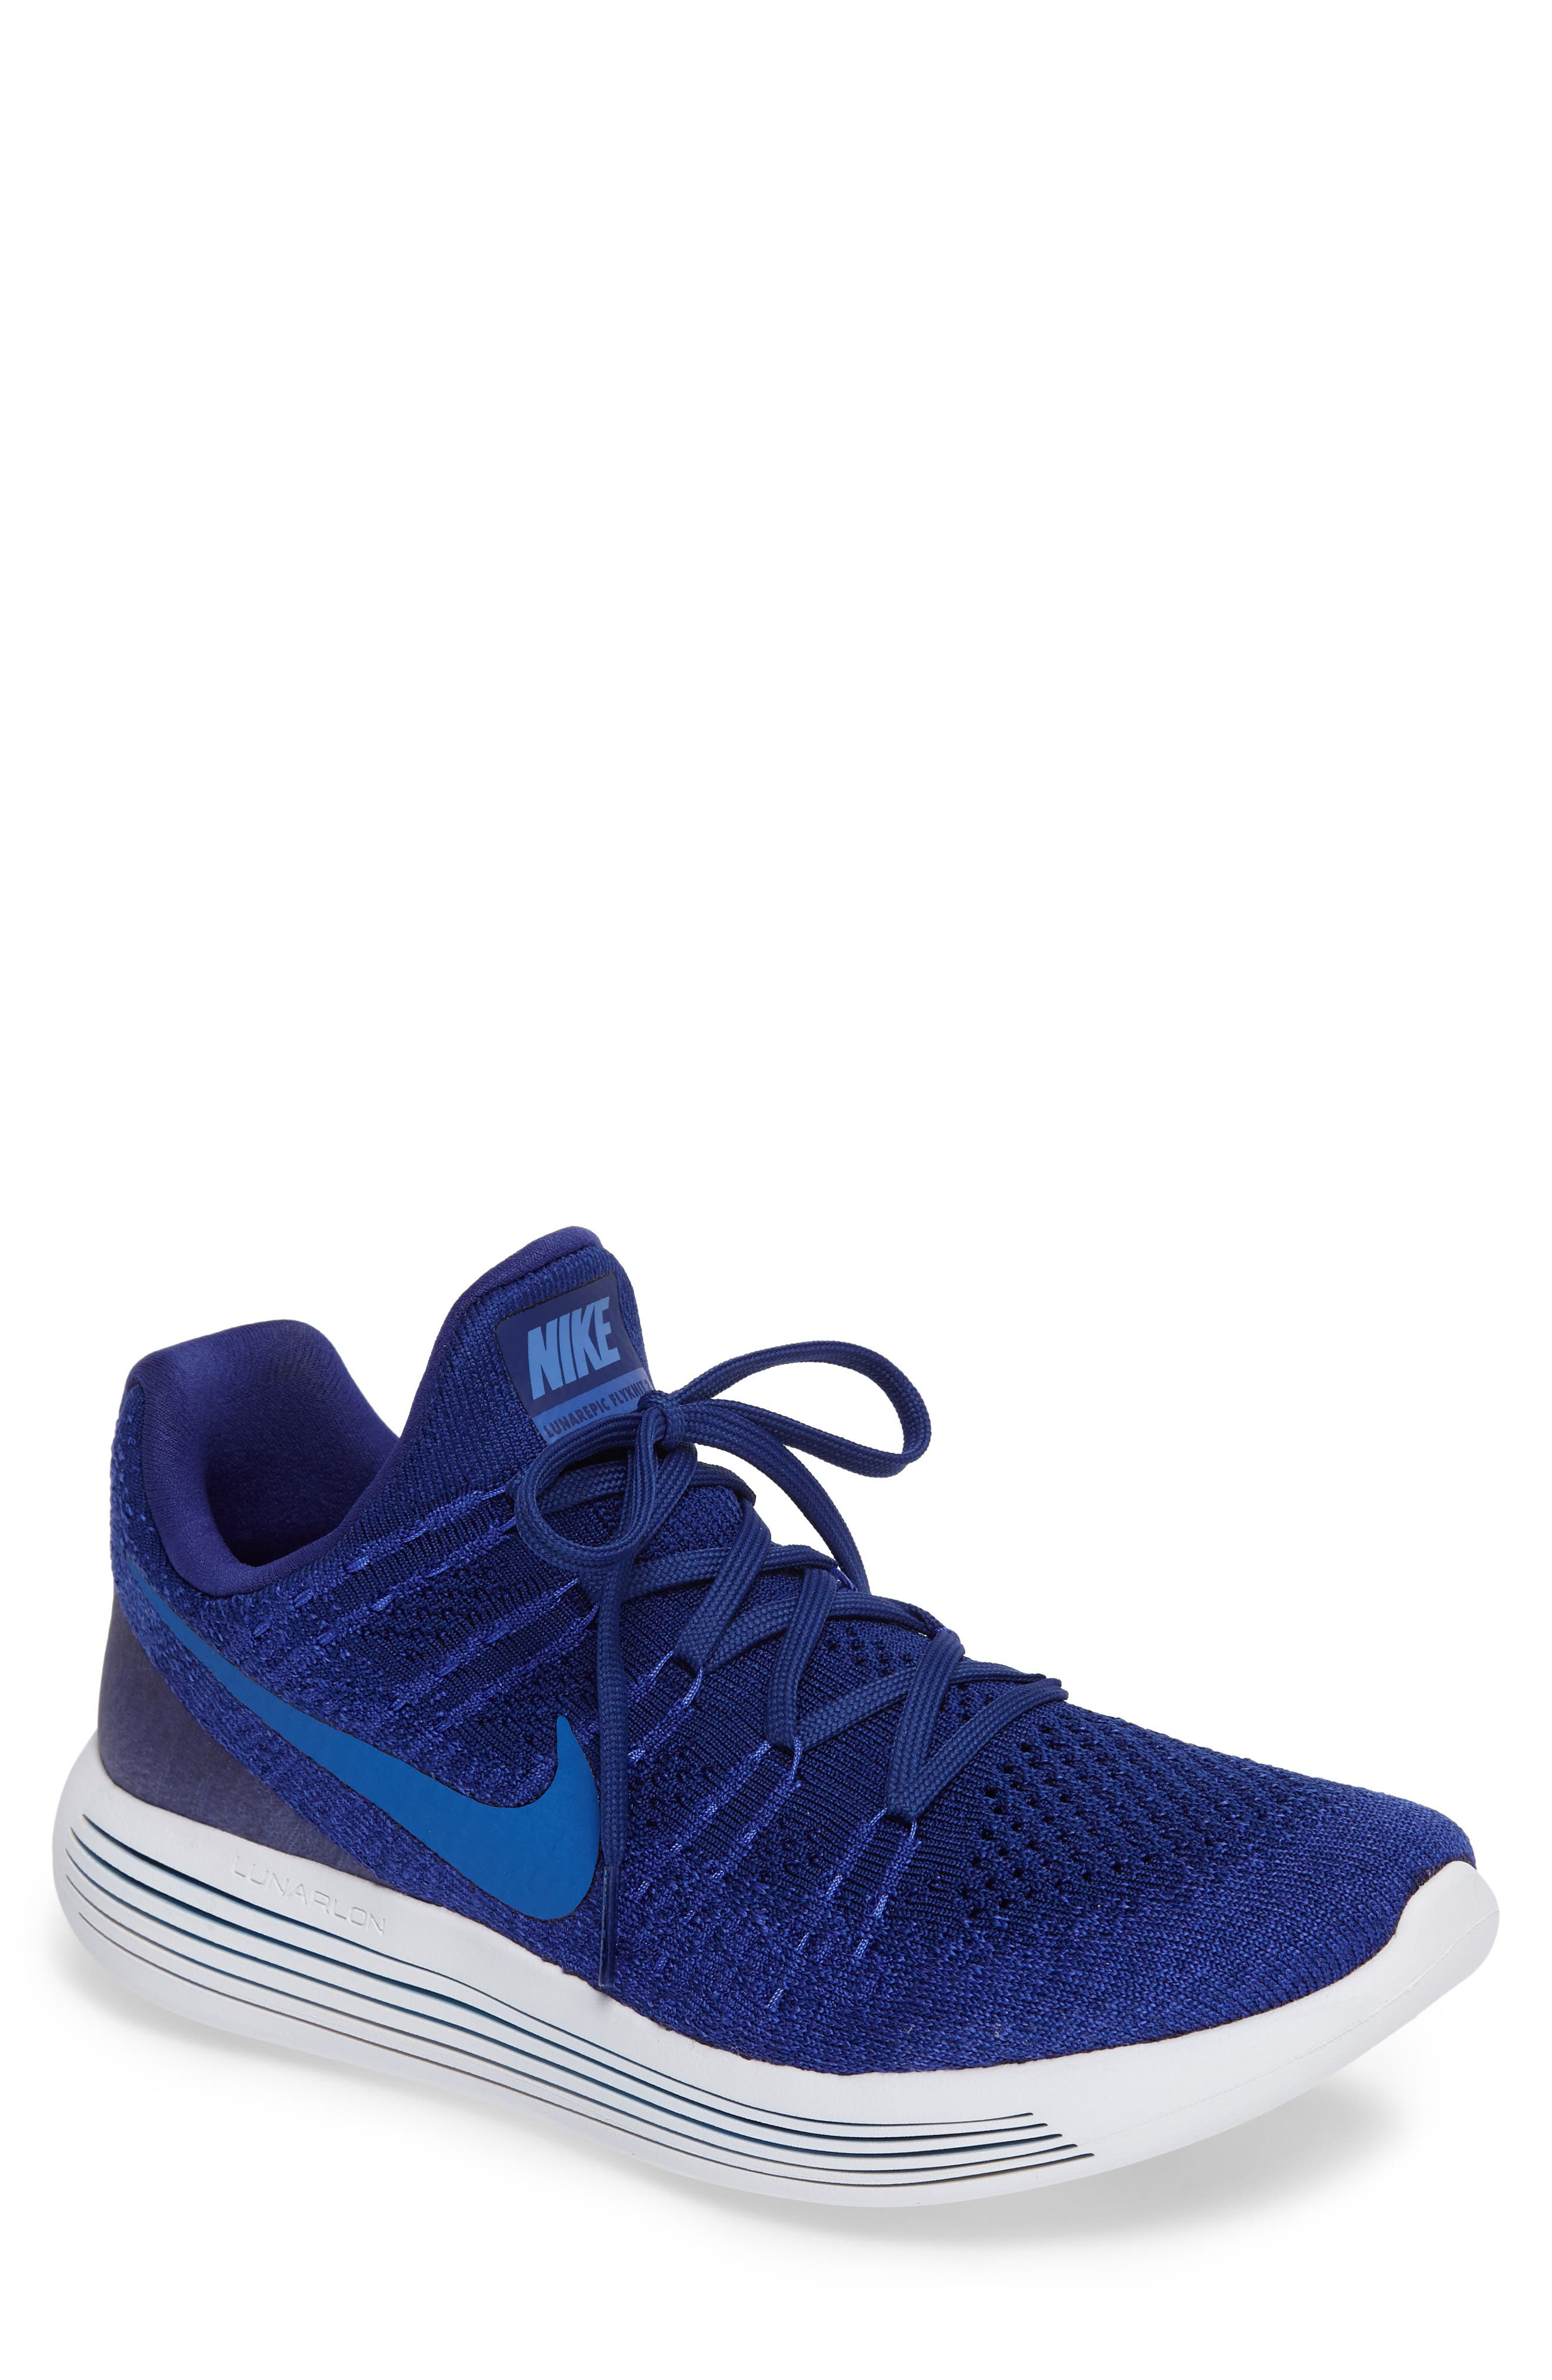 Flyknit 2 LunarEpic Running Shoe,                             Main thumbnail 1, color,                             Royal Blue/ Blue